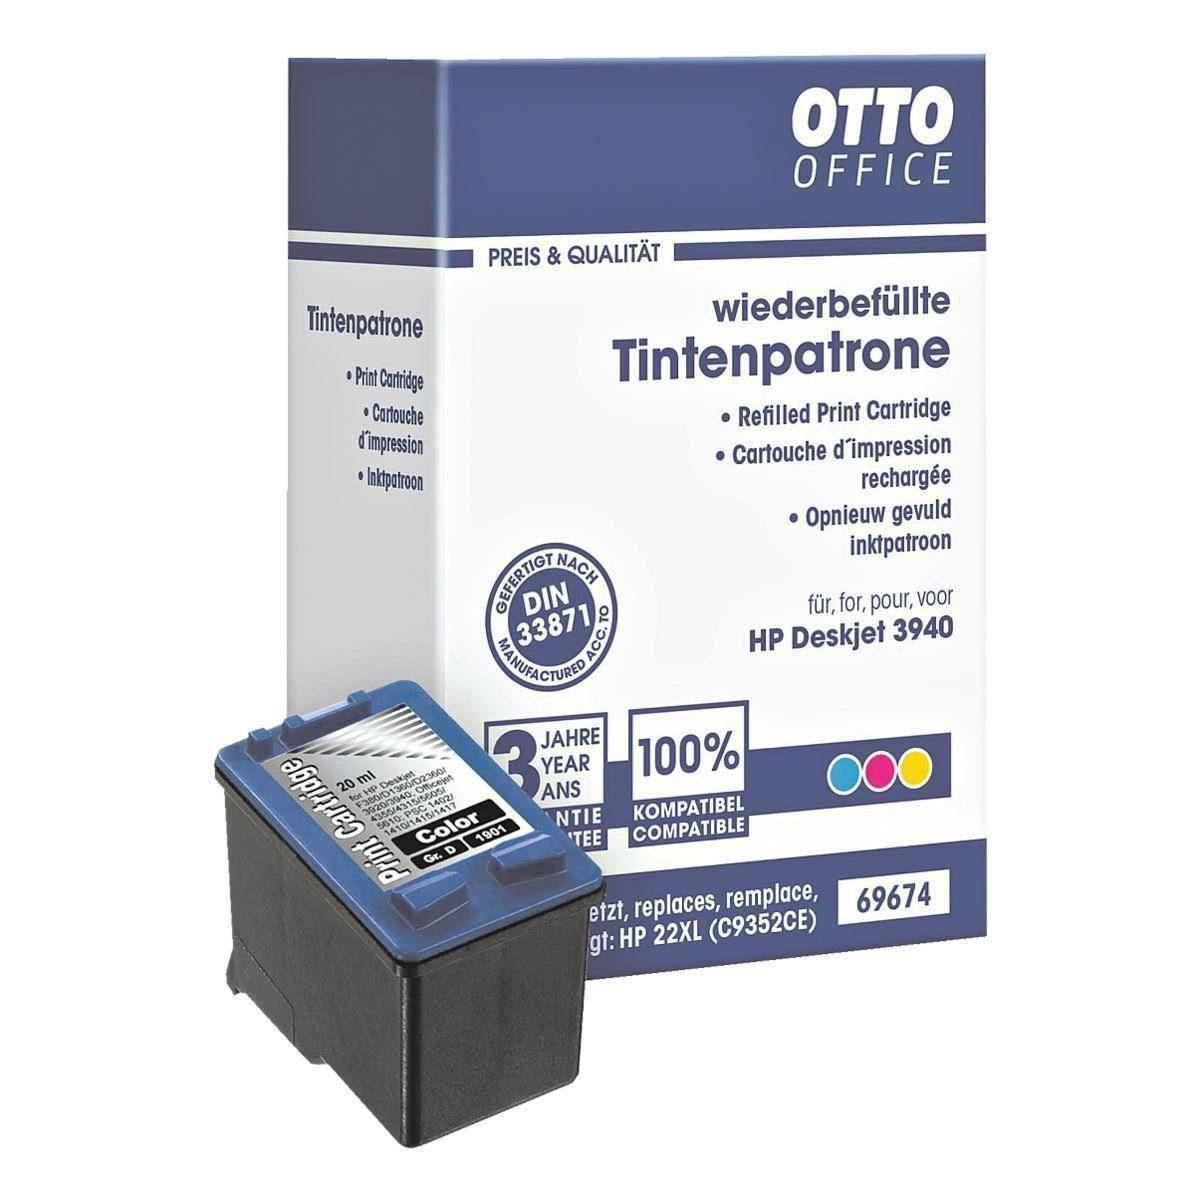 OTTO Office Standard Tintenpatrone ersetzt HP »C9352AE« Nr. 22